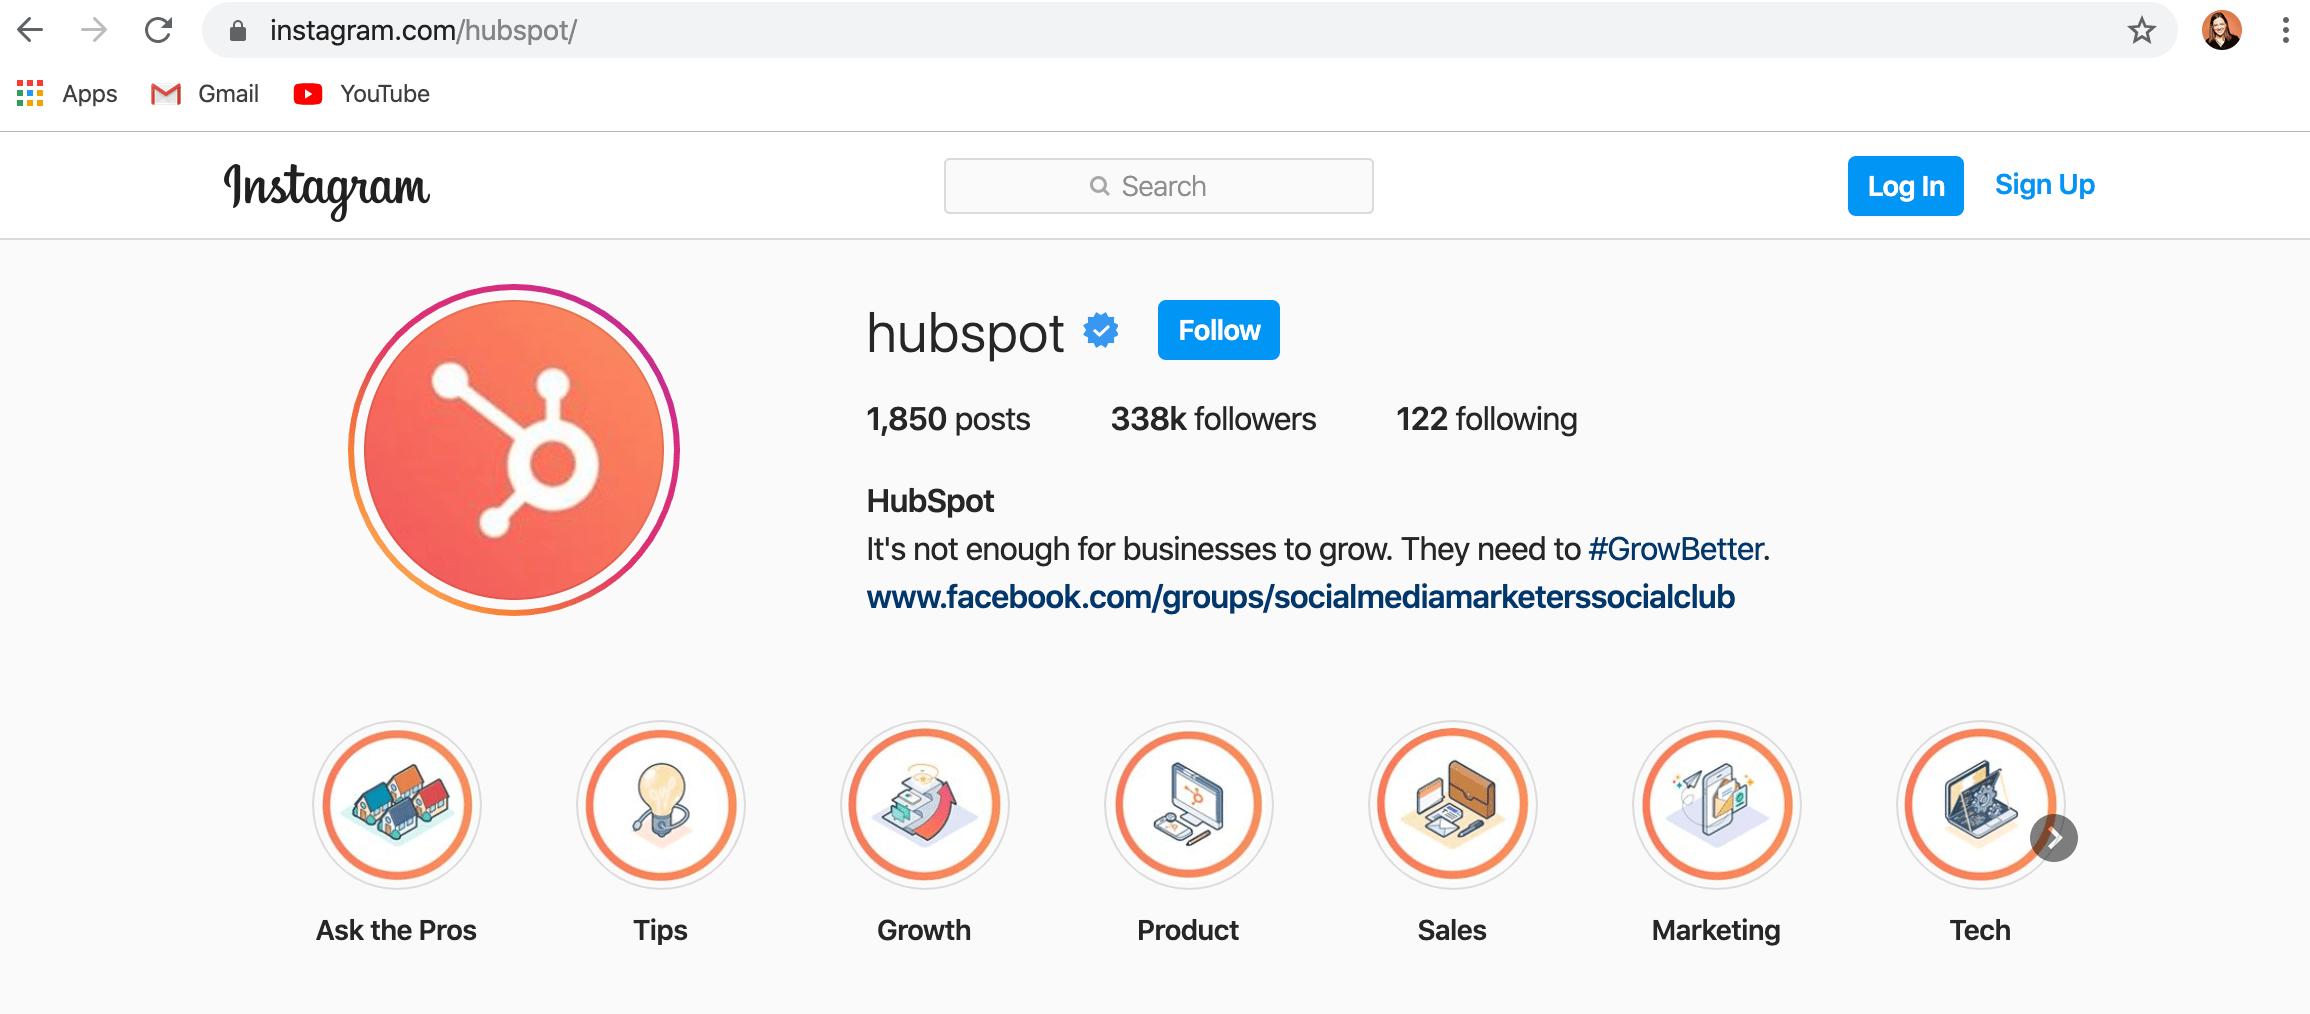 versione desktop dell'account instagram hubspot